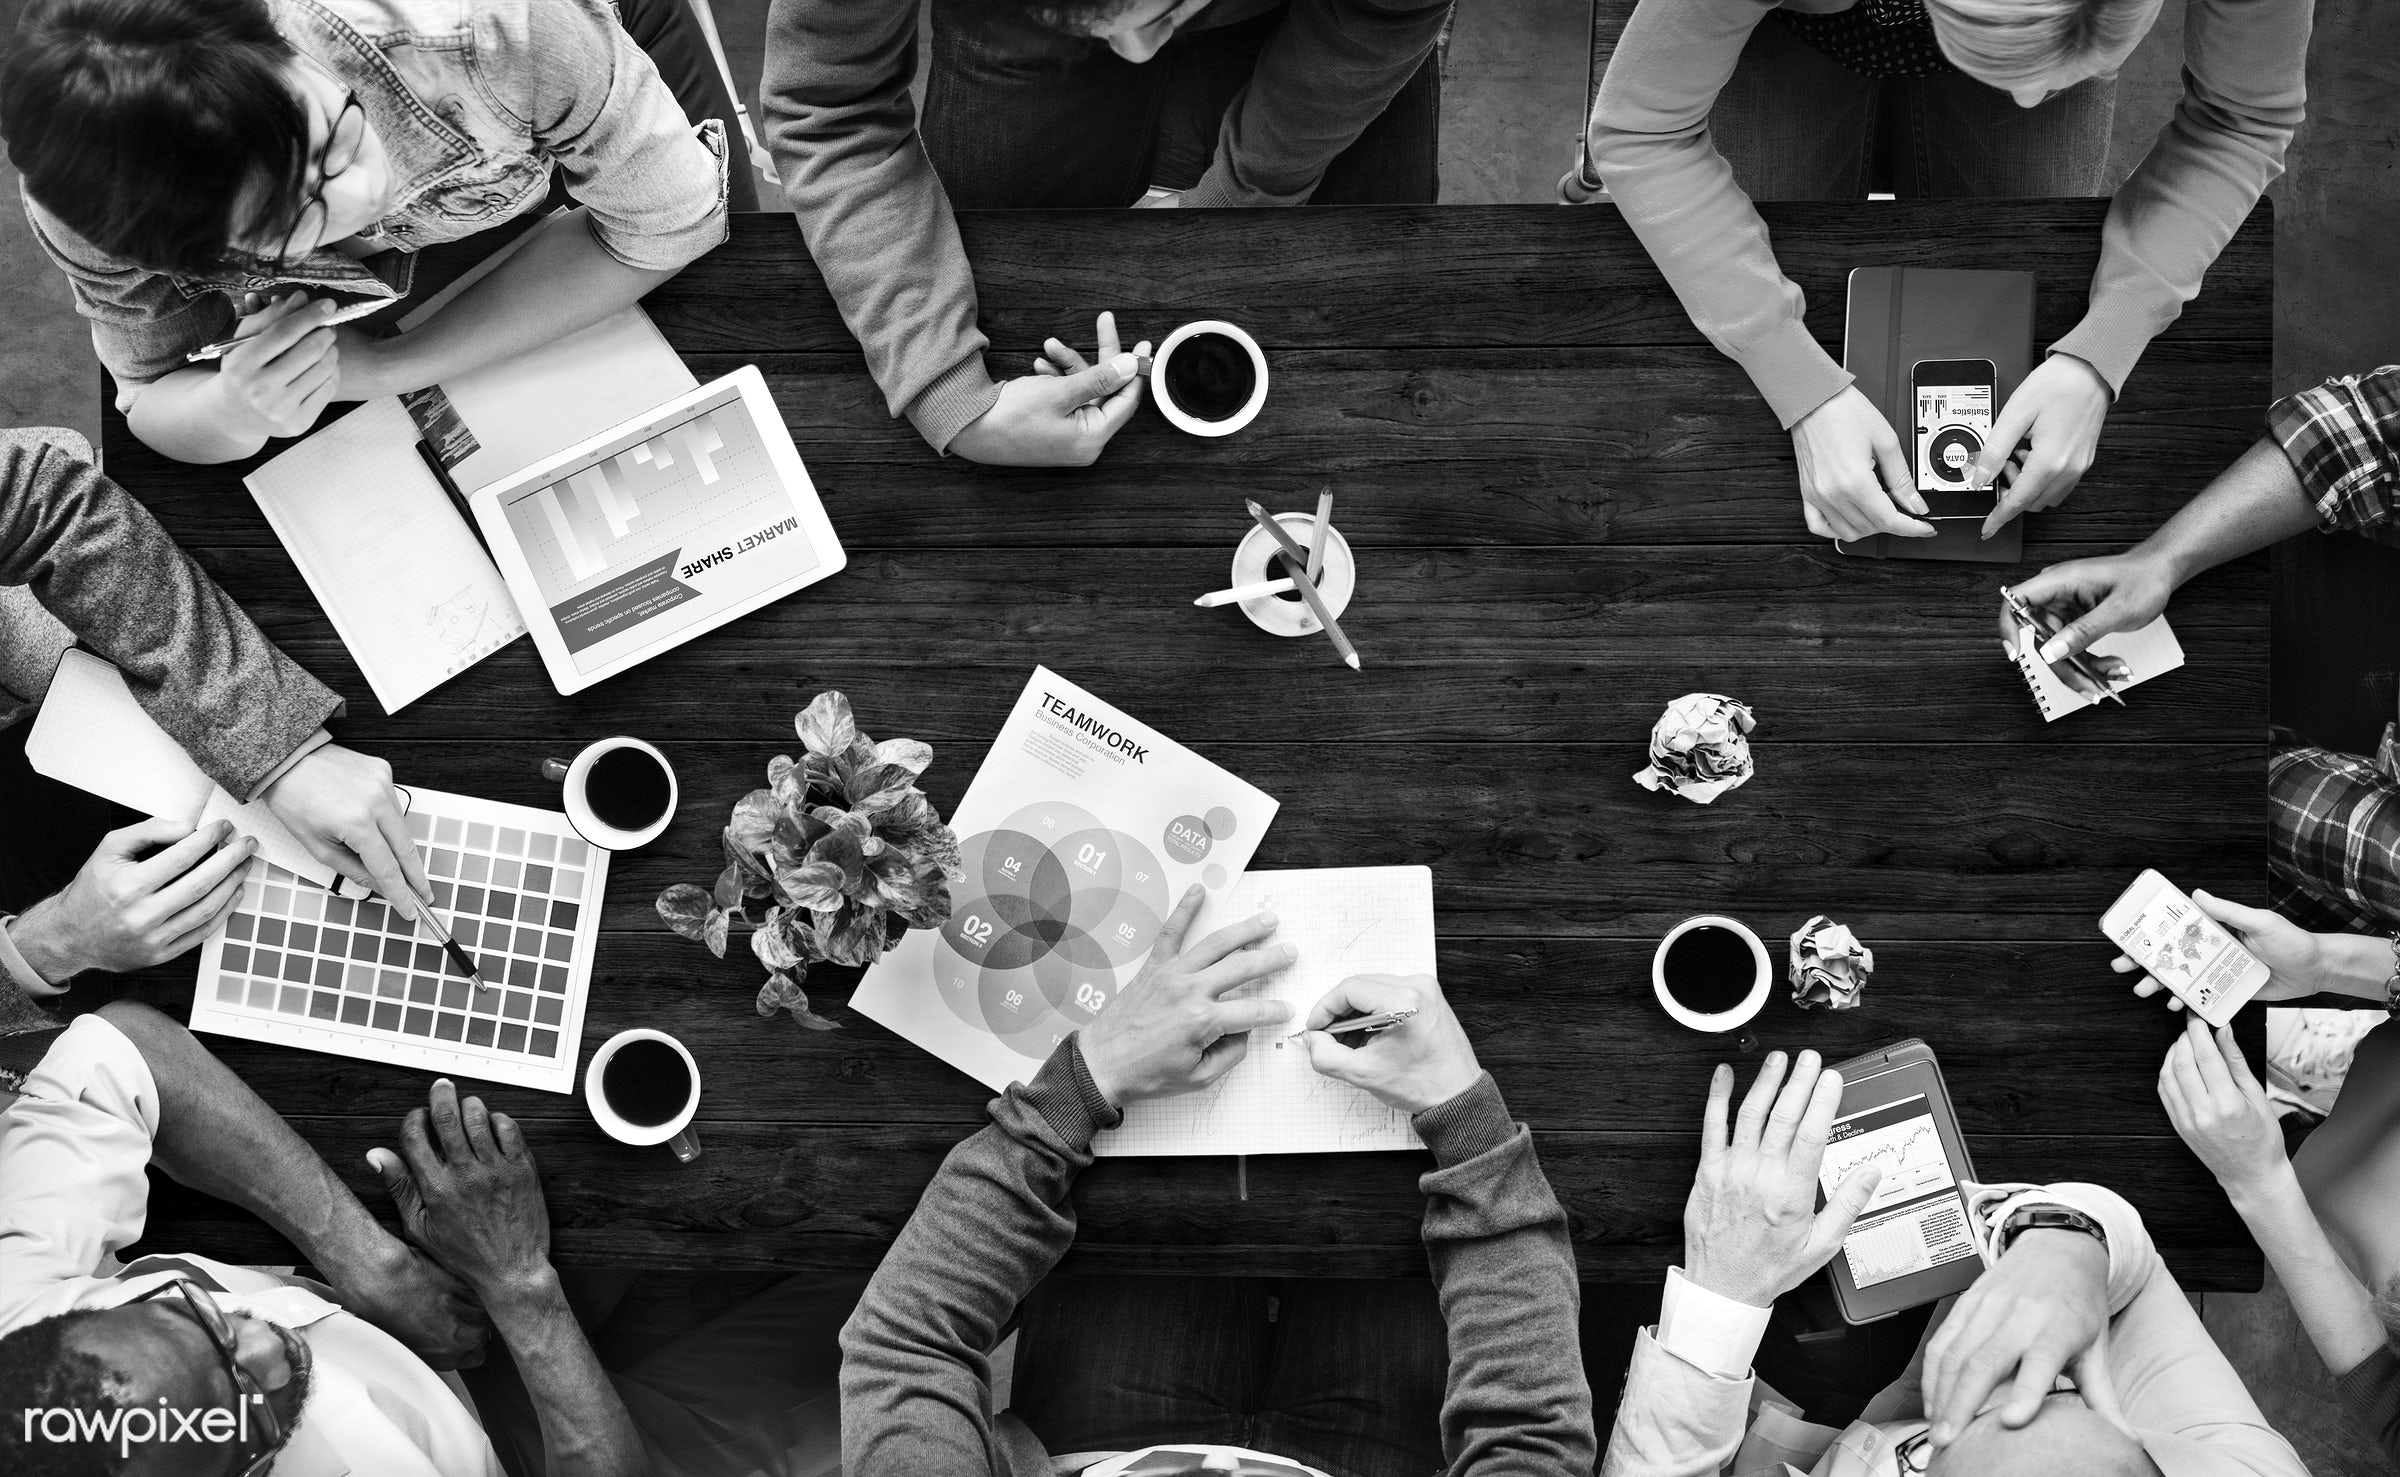 contemporary, aerial view, analysis, brainstorming, business, business people, businessman, businessmen, businesswoman,...